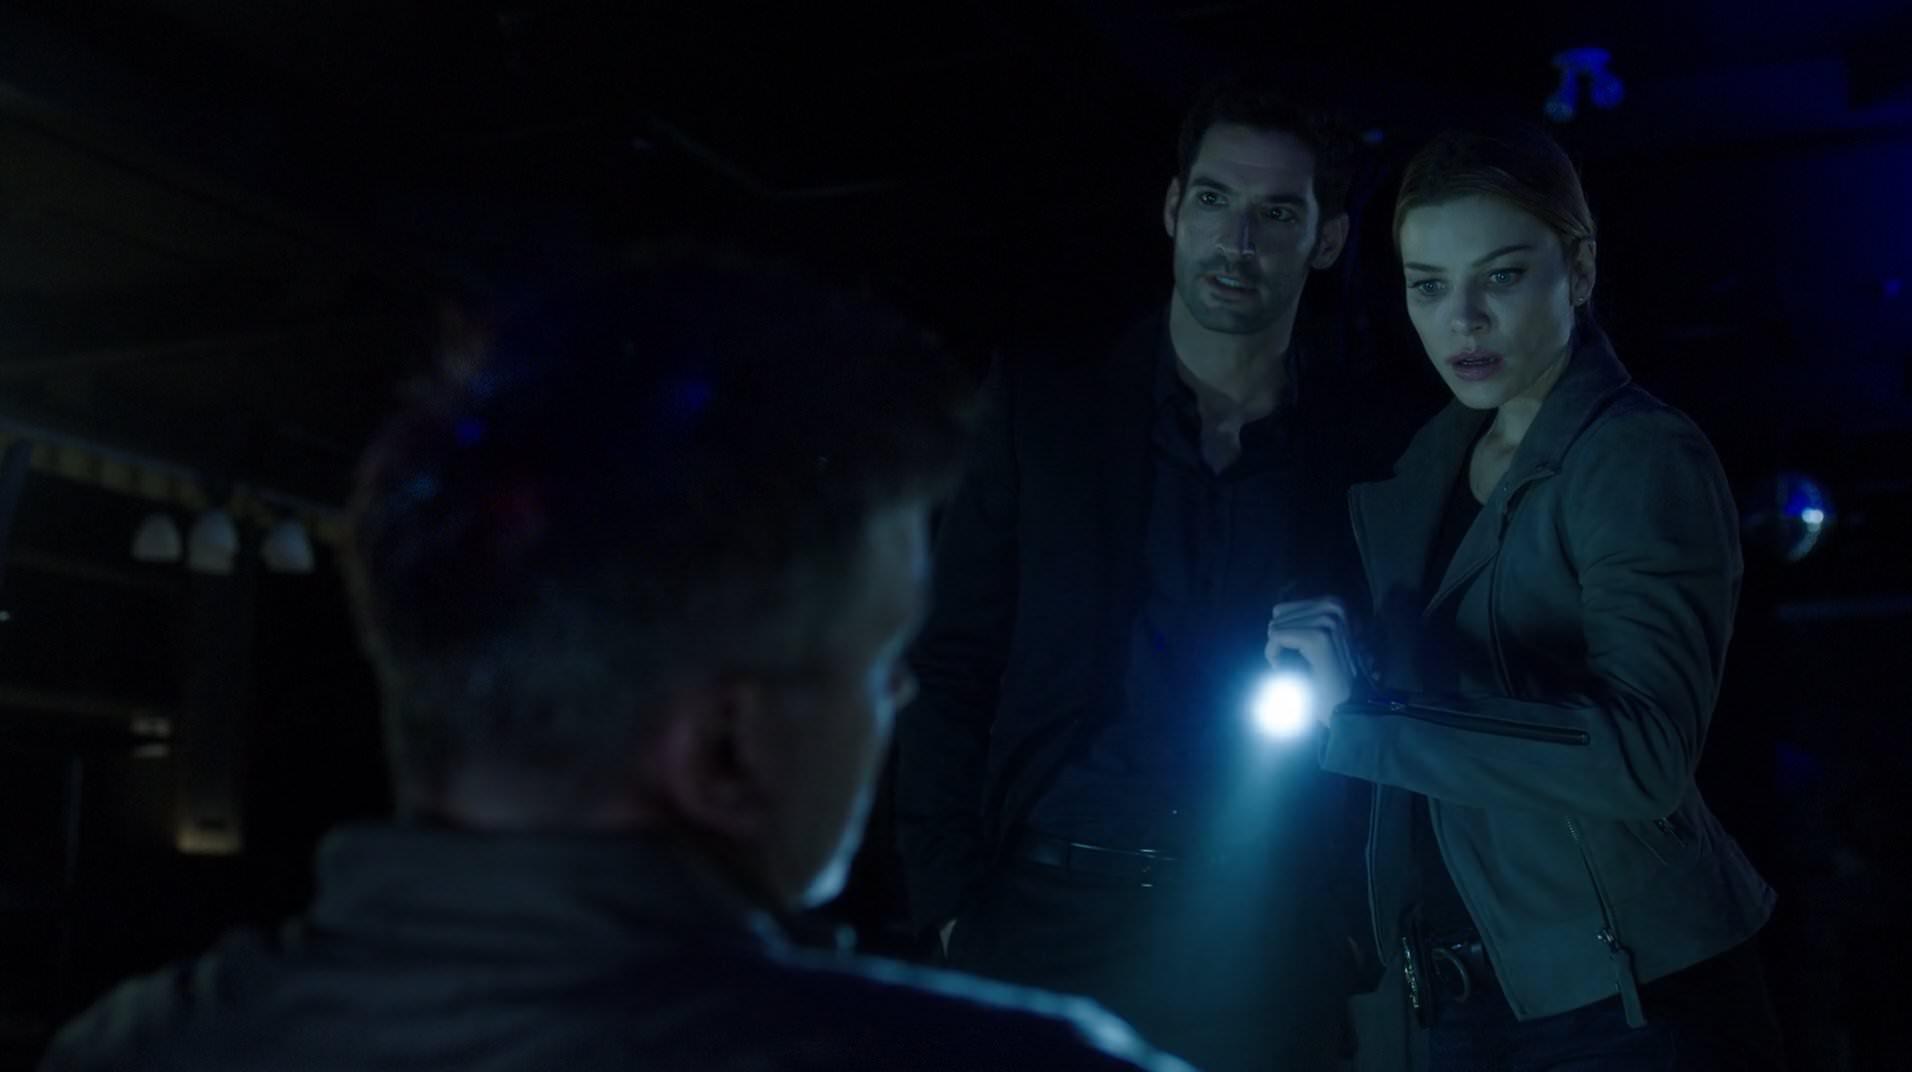 Lucifer 1x08 Et tu, Doctor Screencaps - Lucifer (Fox